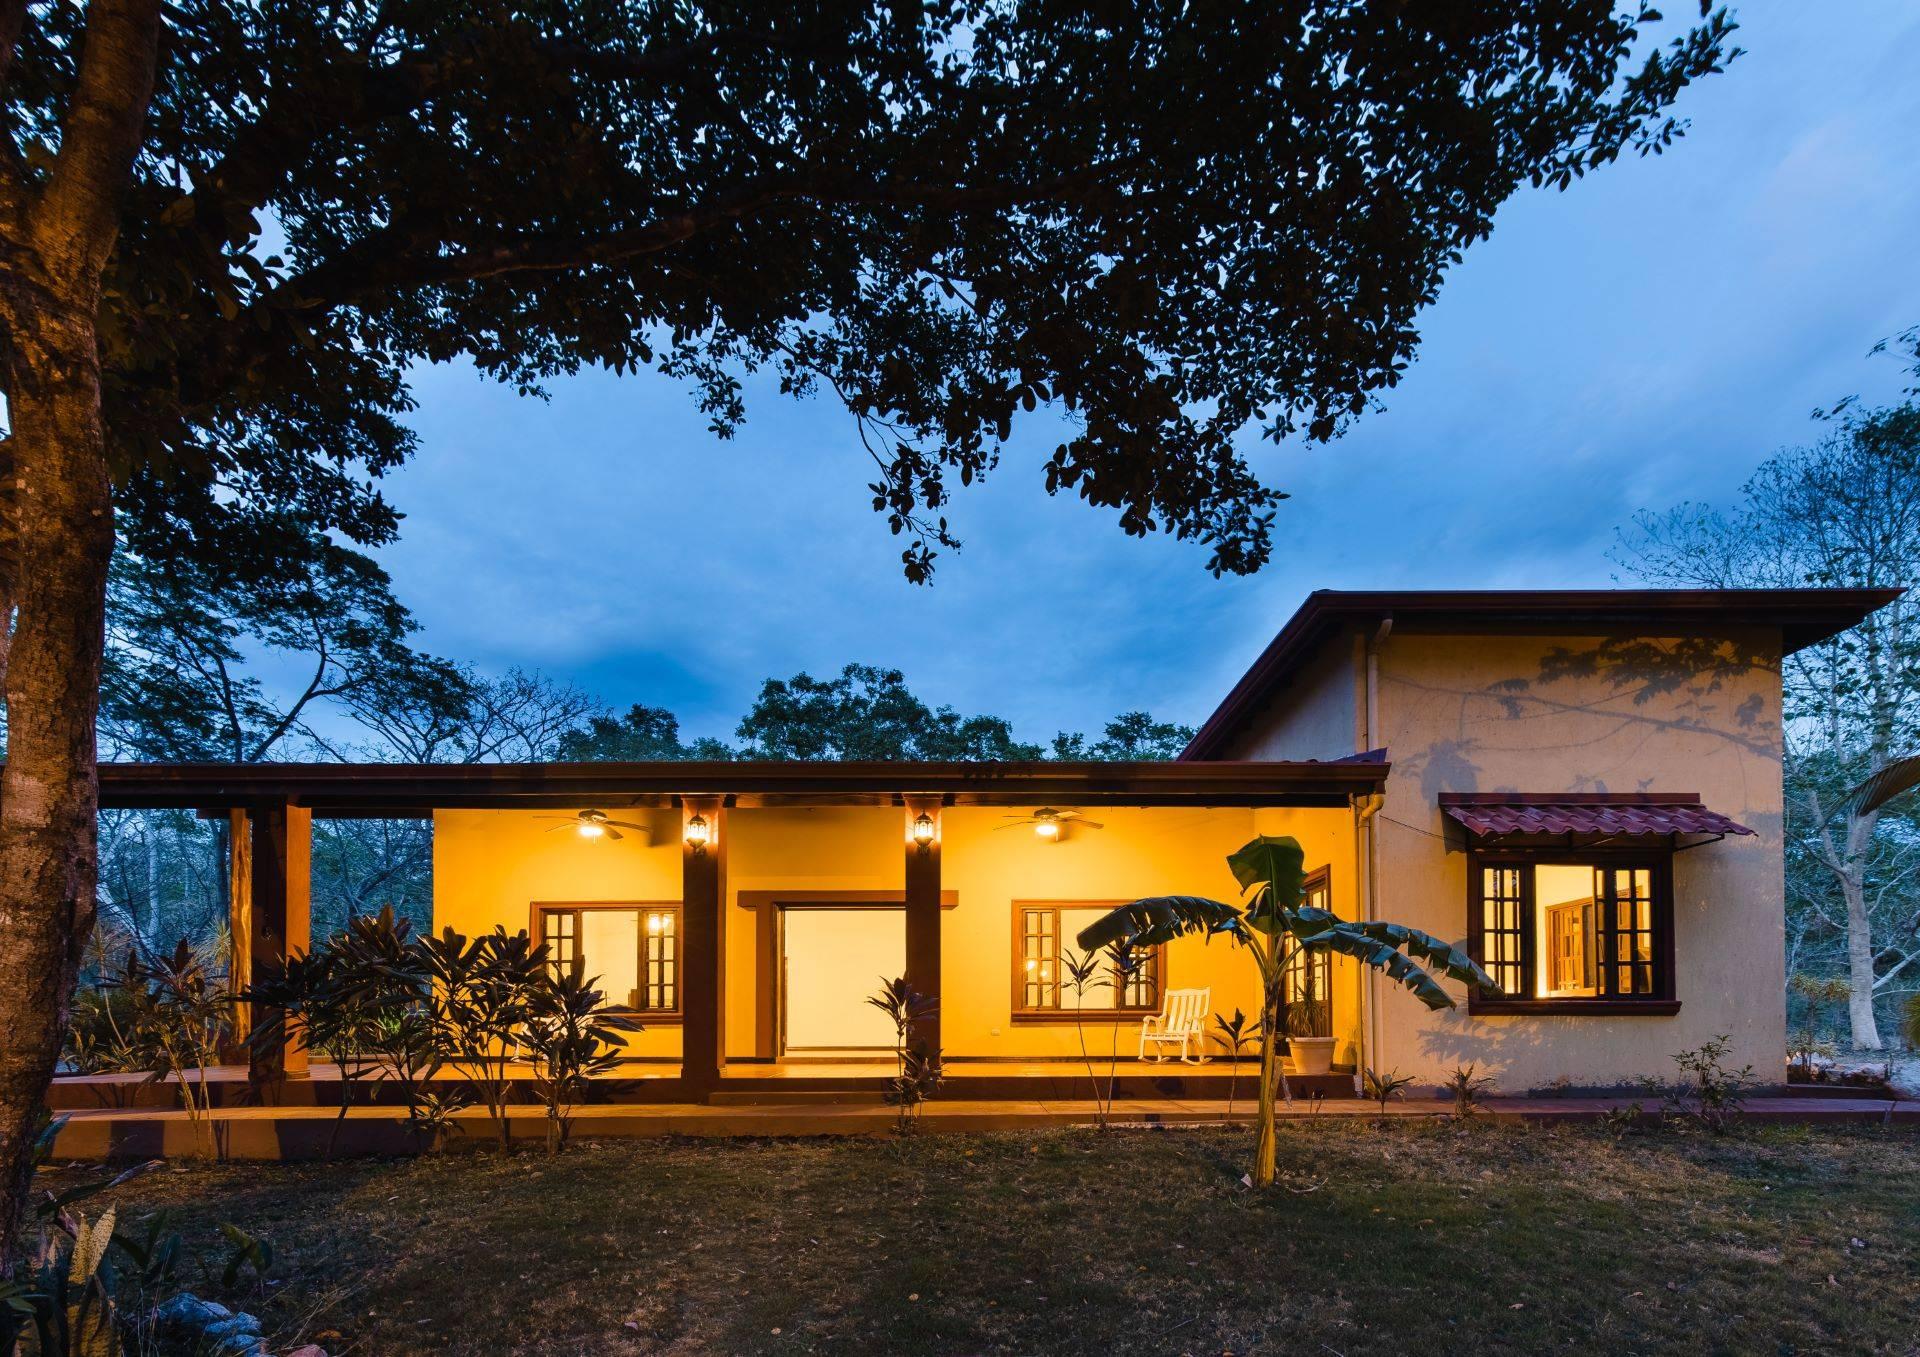 Traditional Costa Rican Hacienda Style Home